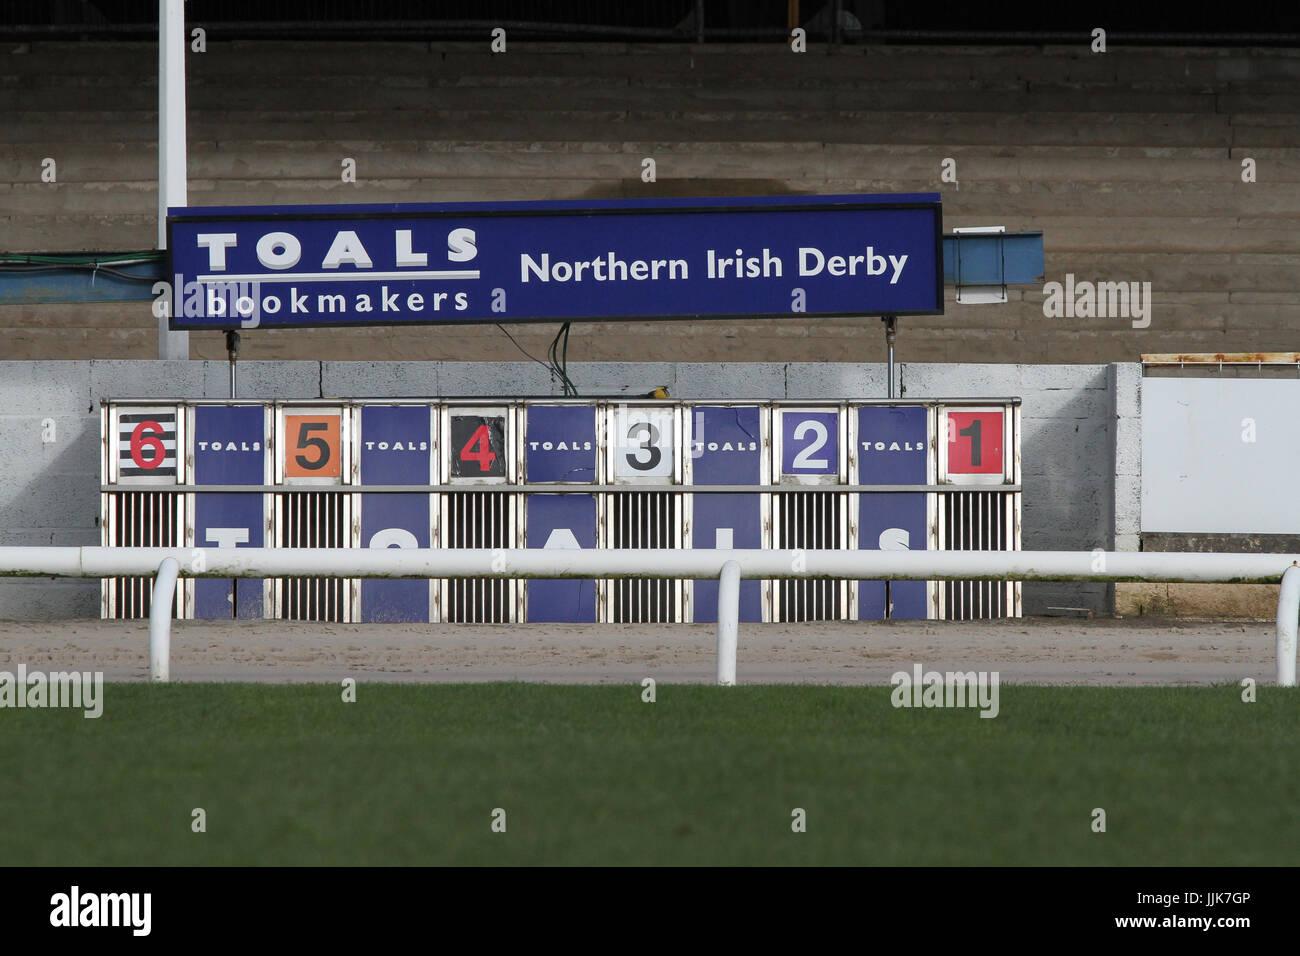 Greyhound trap at greyhound stadium. - Stock Image